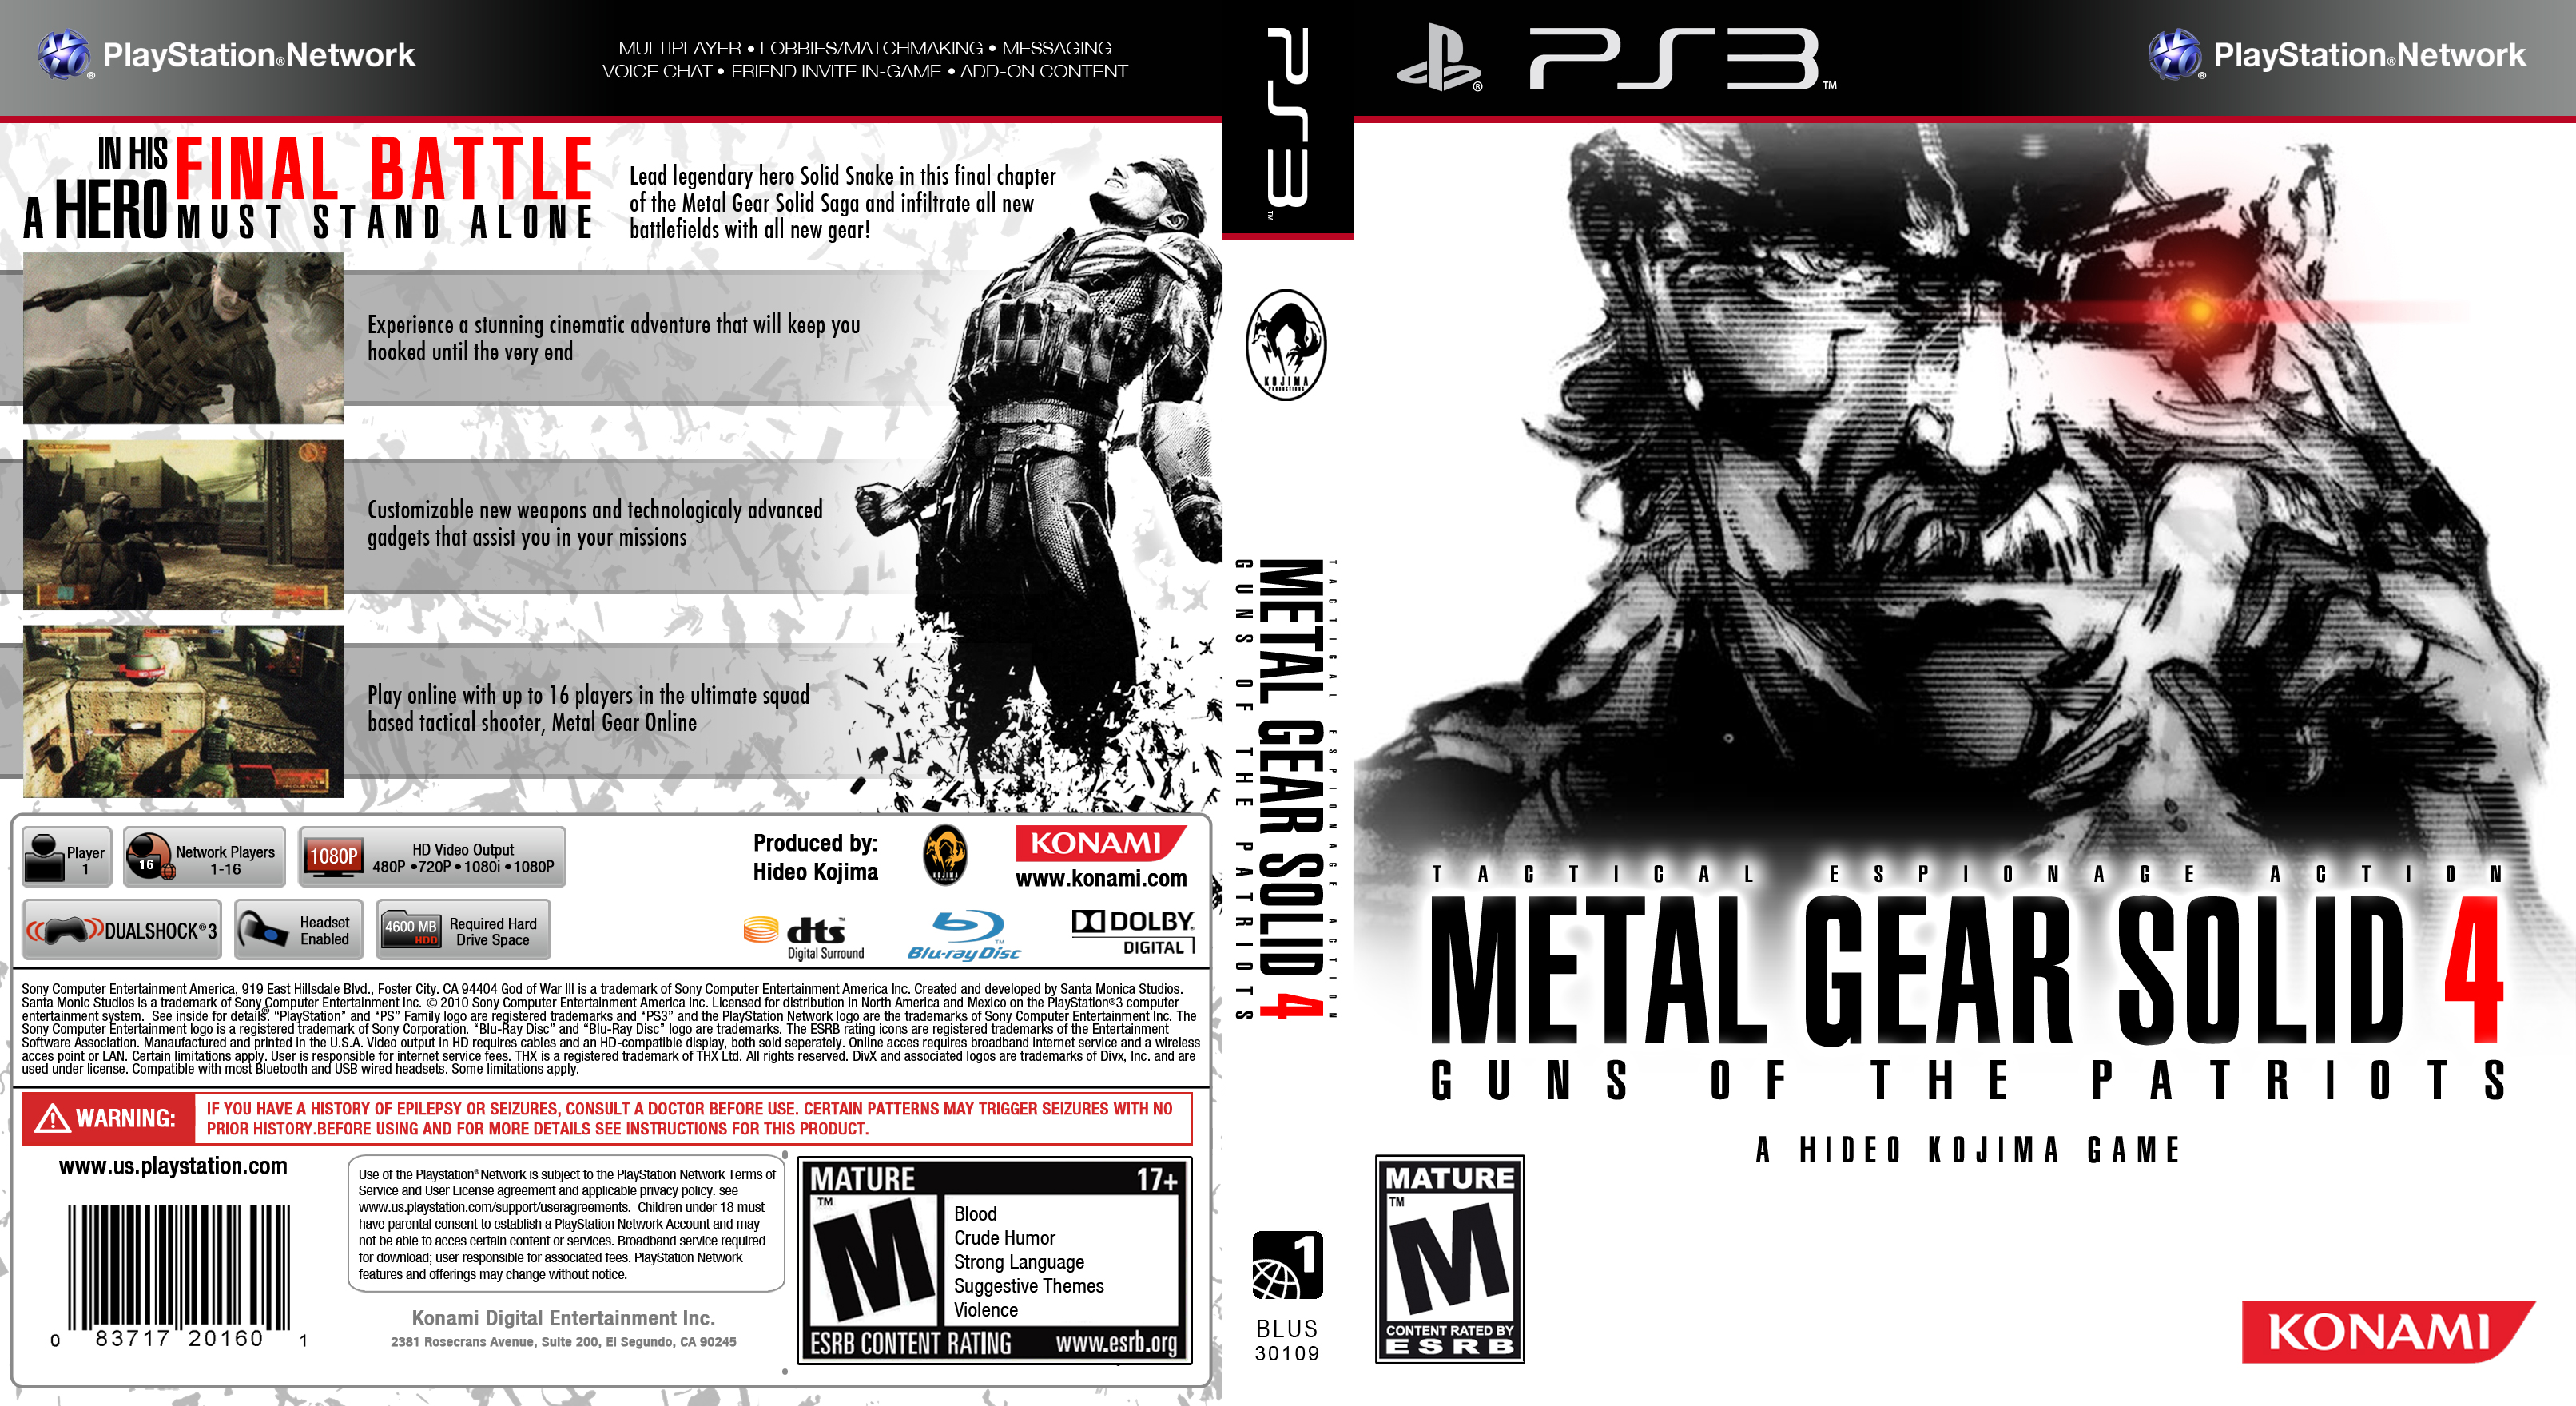 Custom Metal Gear Solid 4 boxart by maXVolnutt on DeviantArt